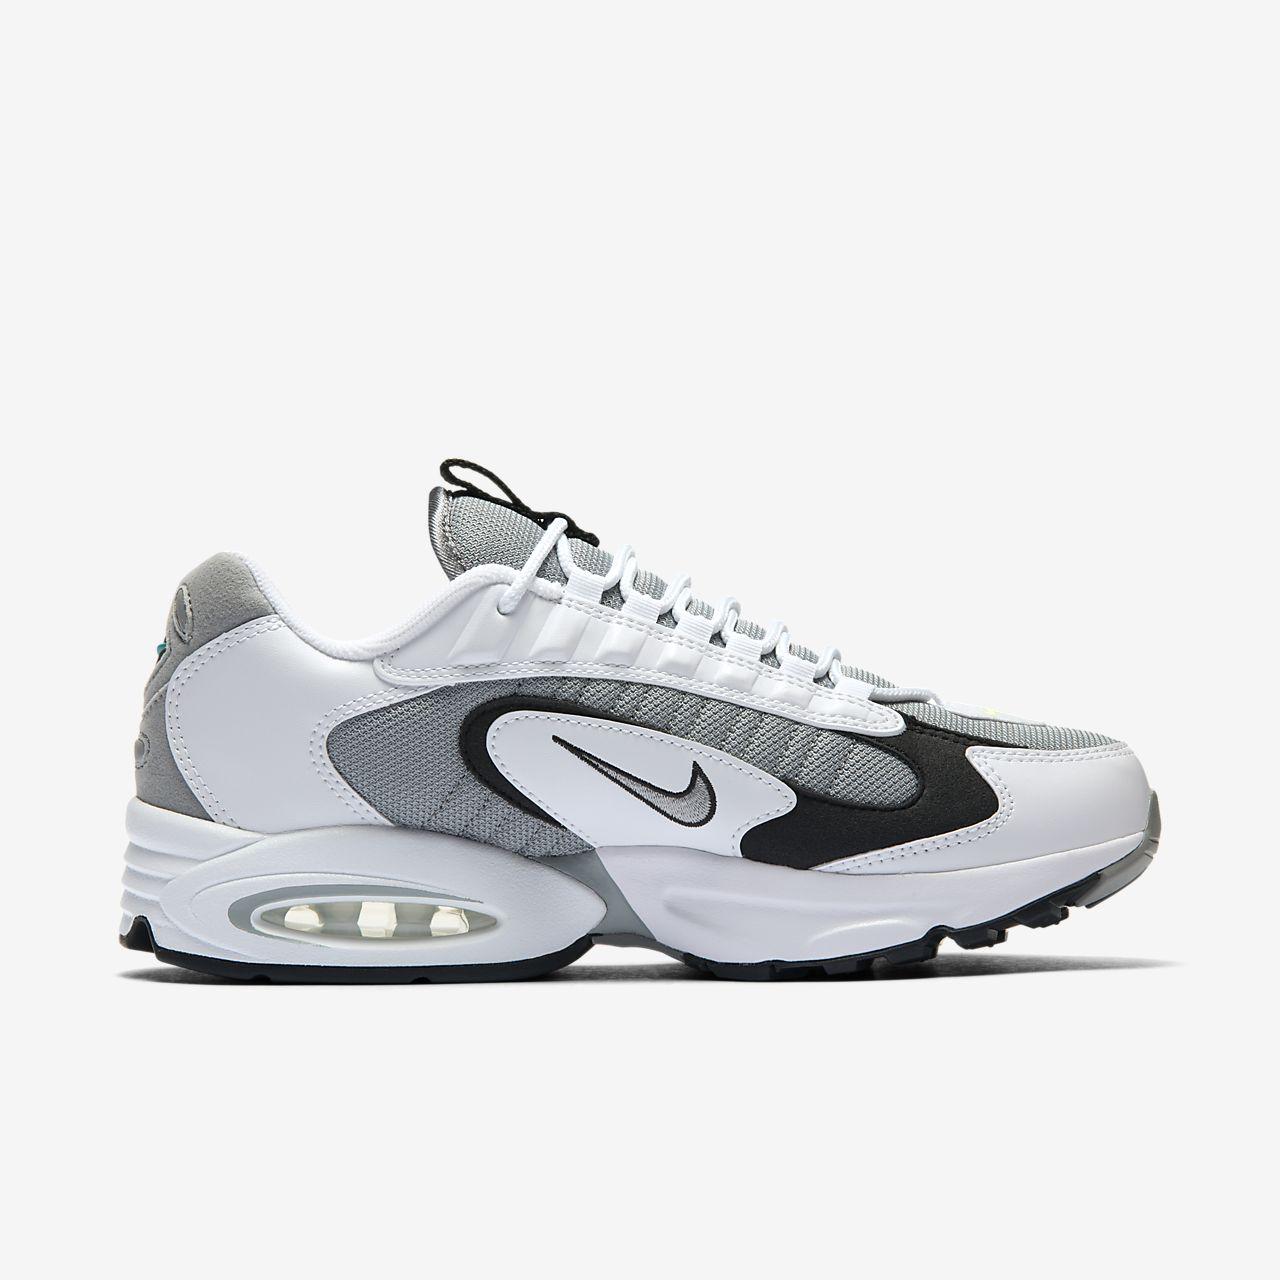 Sko Nike Air Max Triax 96 för män